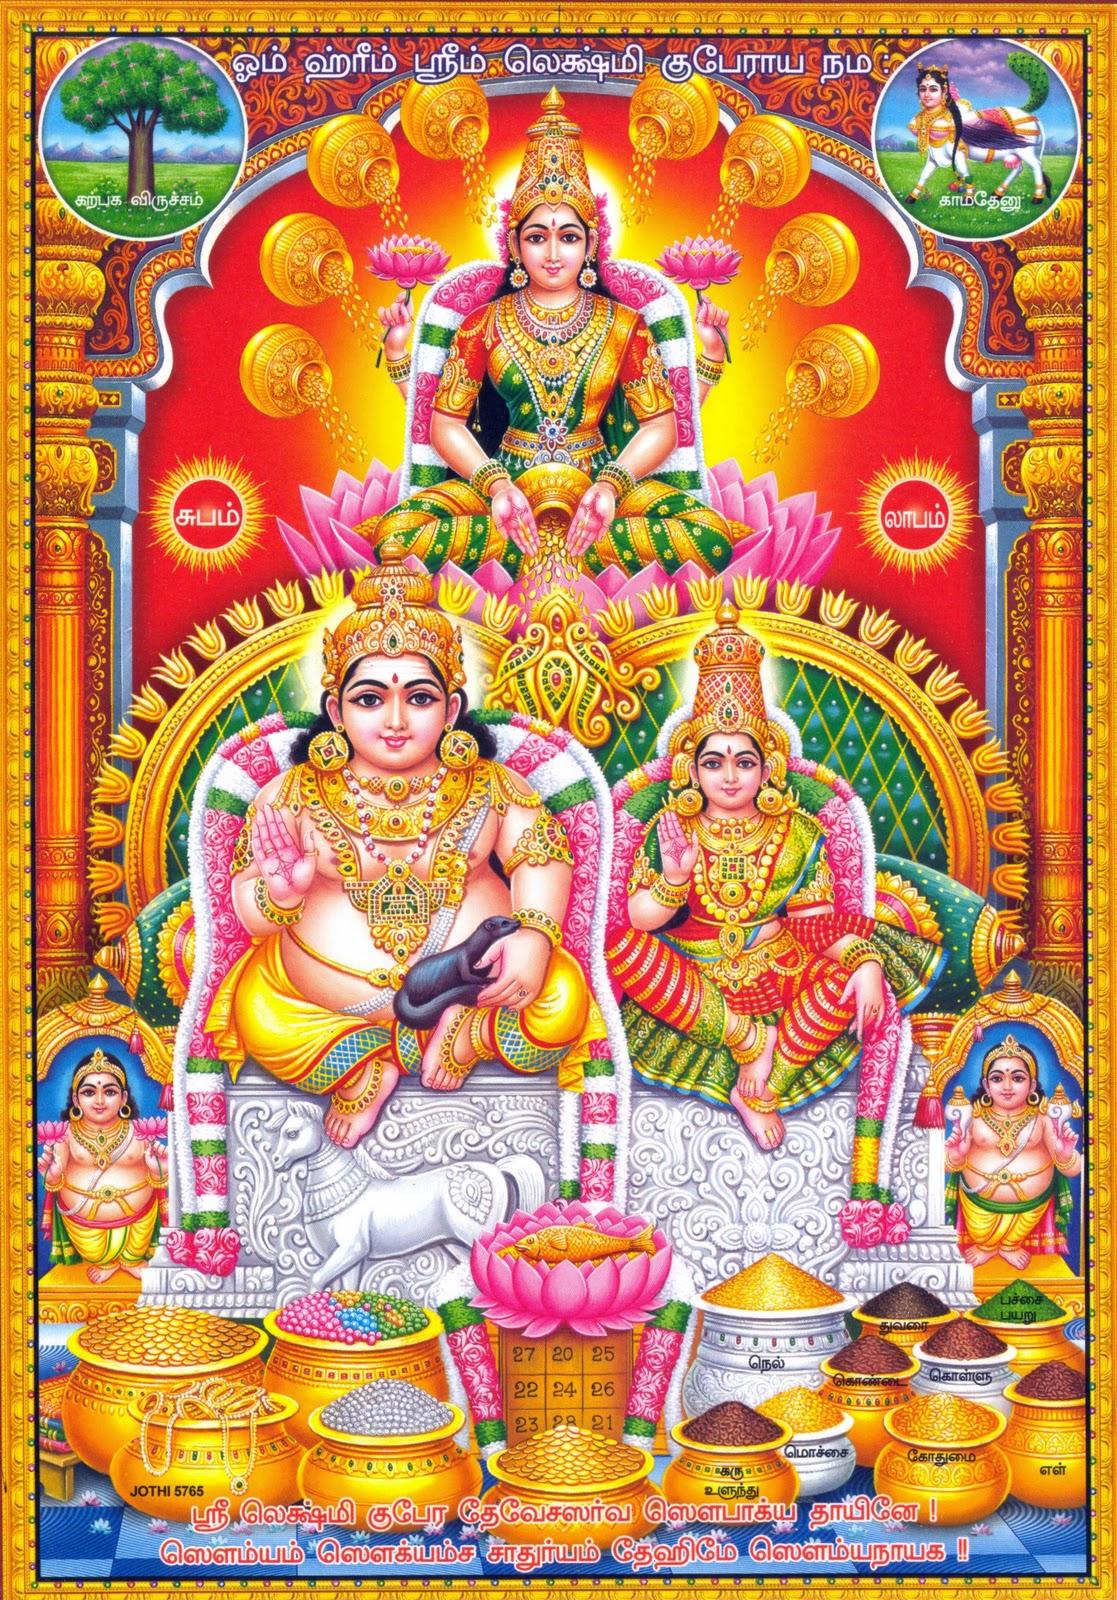 Download free Maa Saraswati HD Wallpaper, images & photos